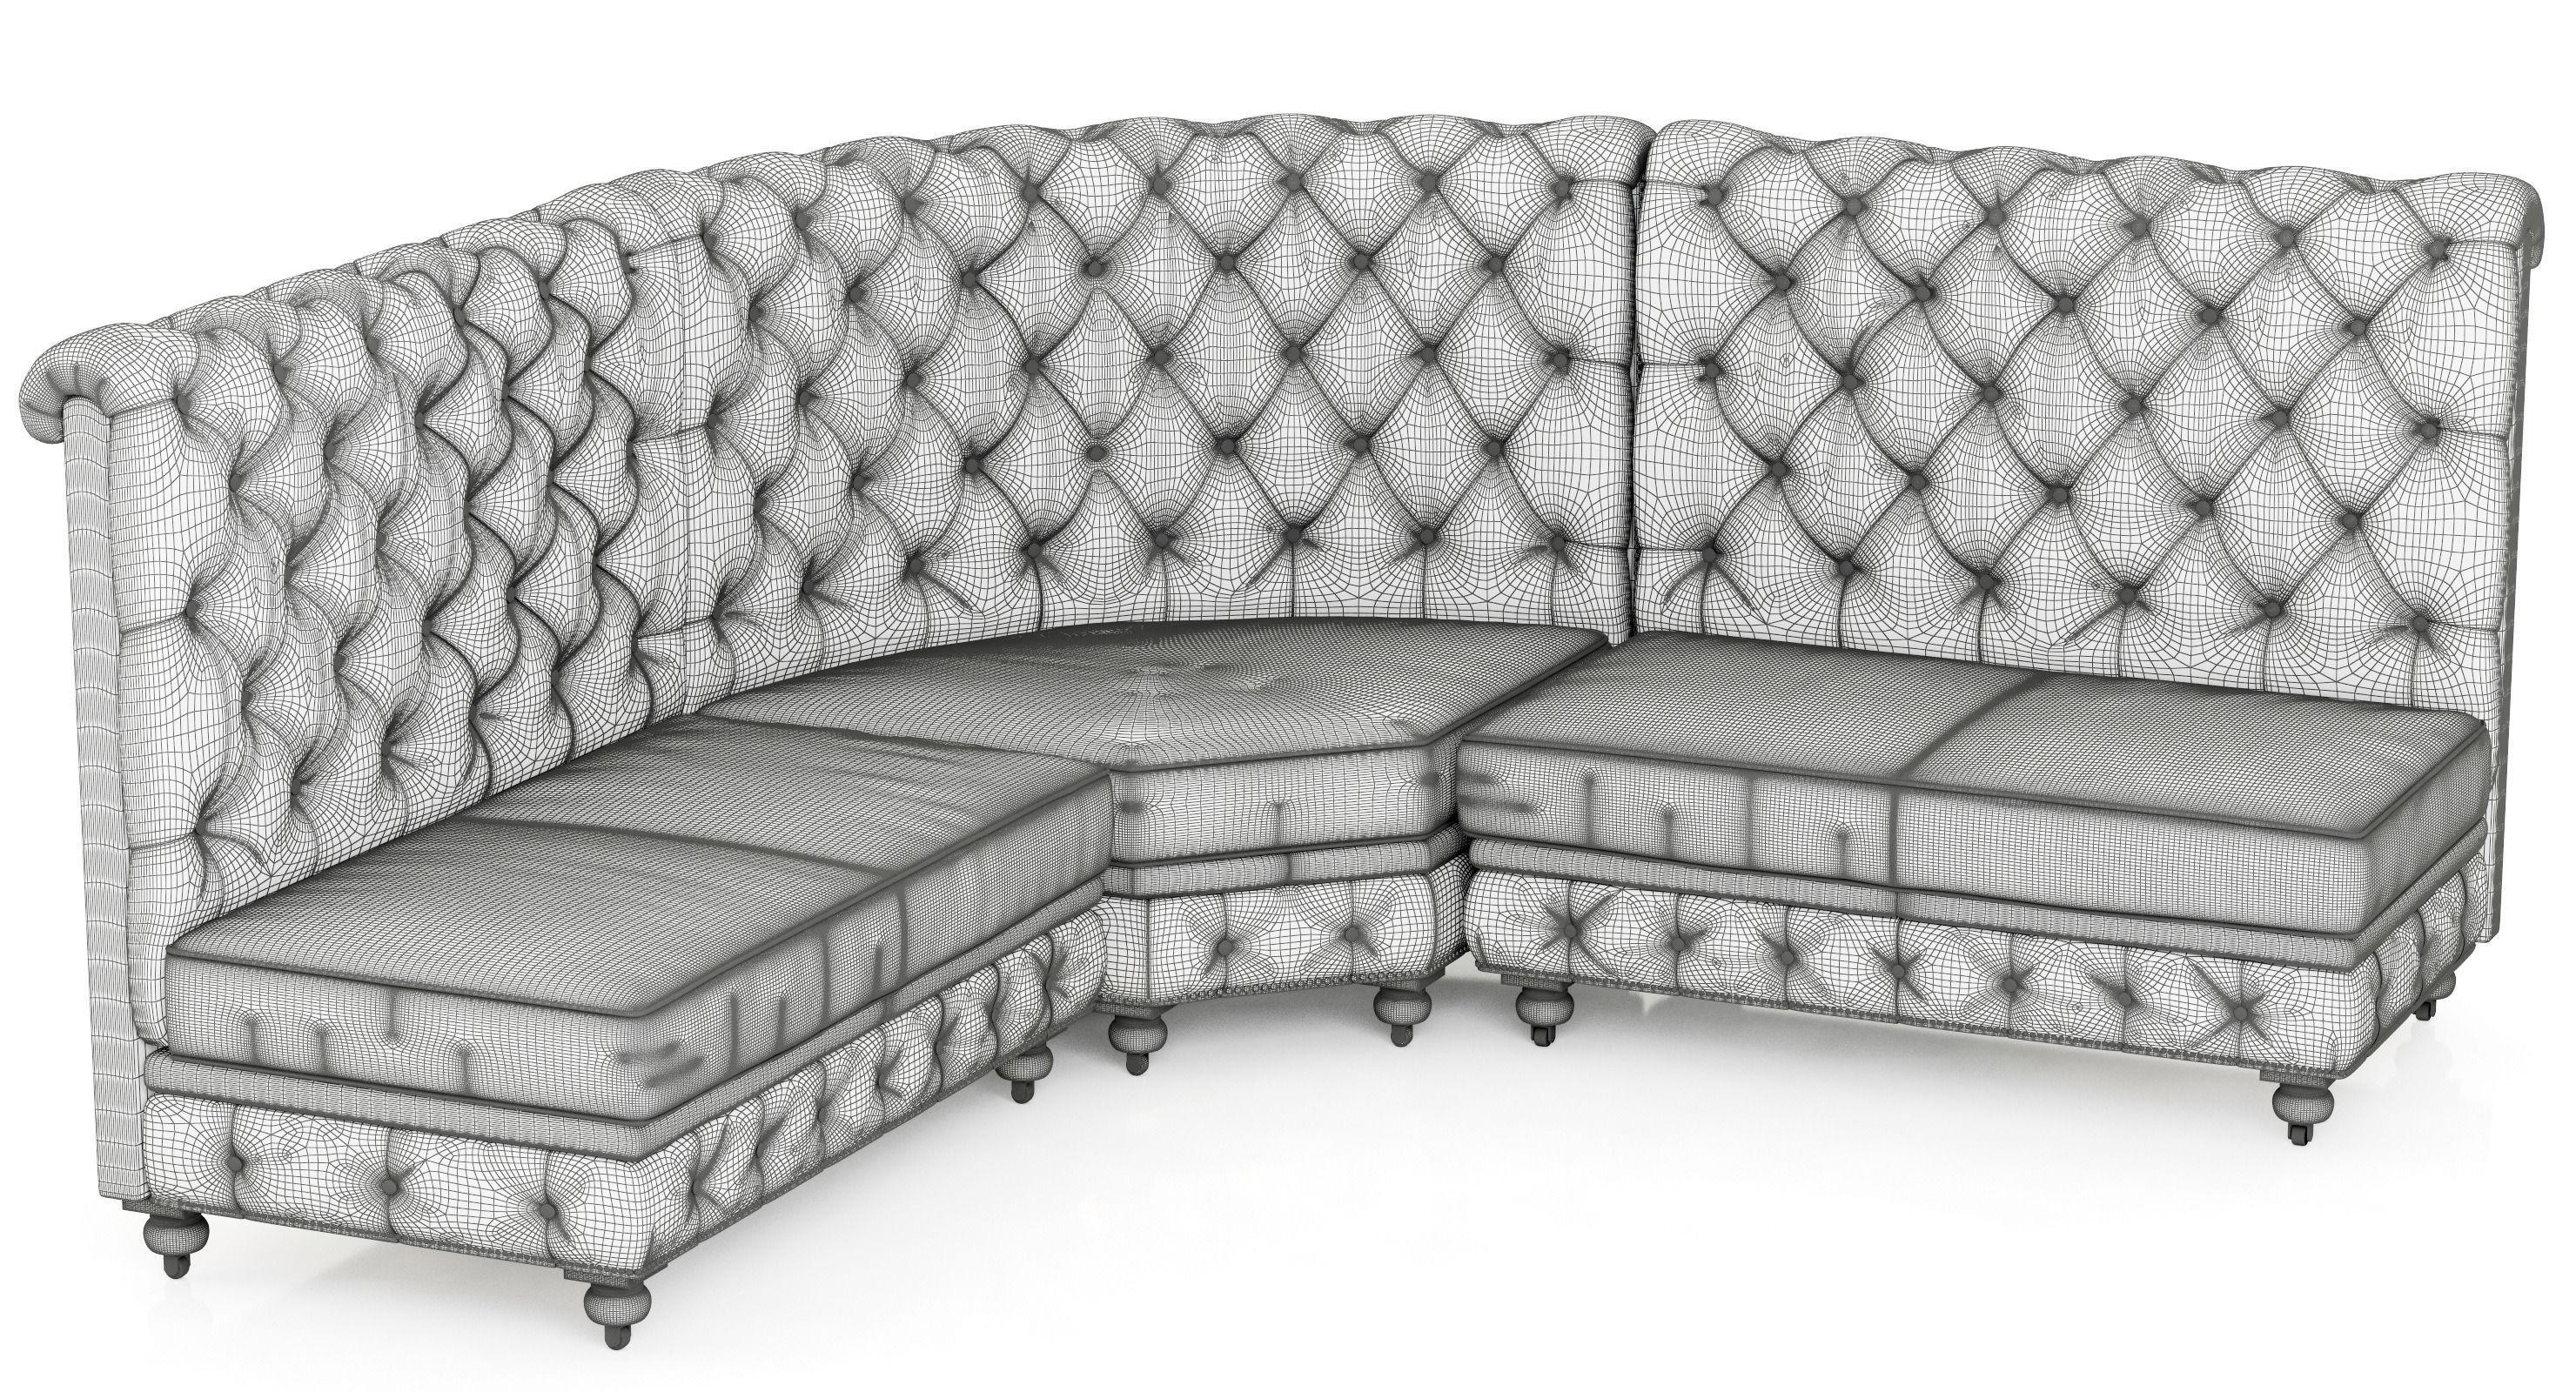 restoration hardware kensington sofa 106 replace rv dinette with leather l banquette 3d